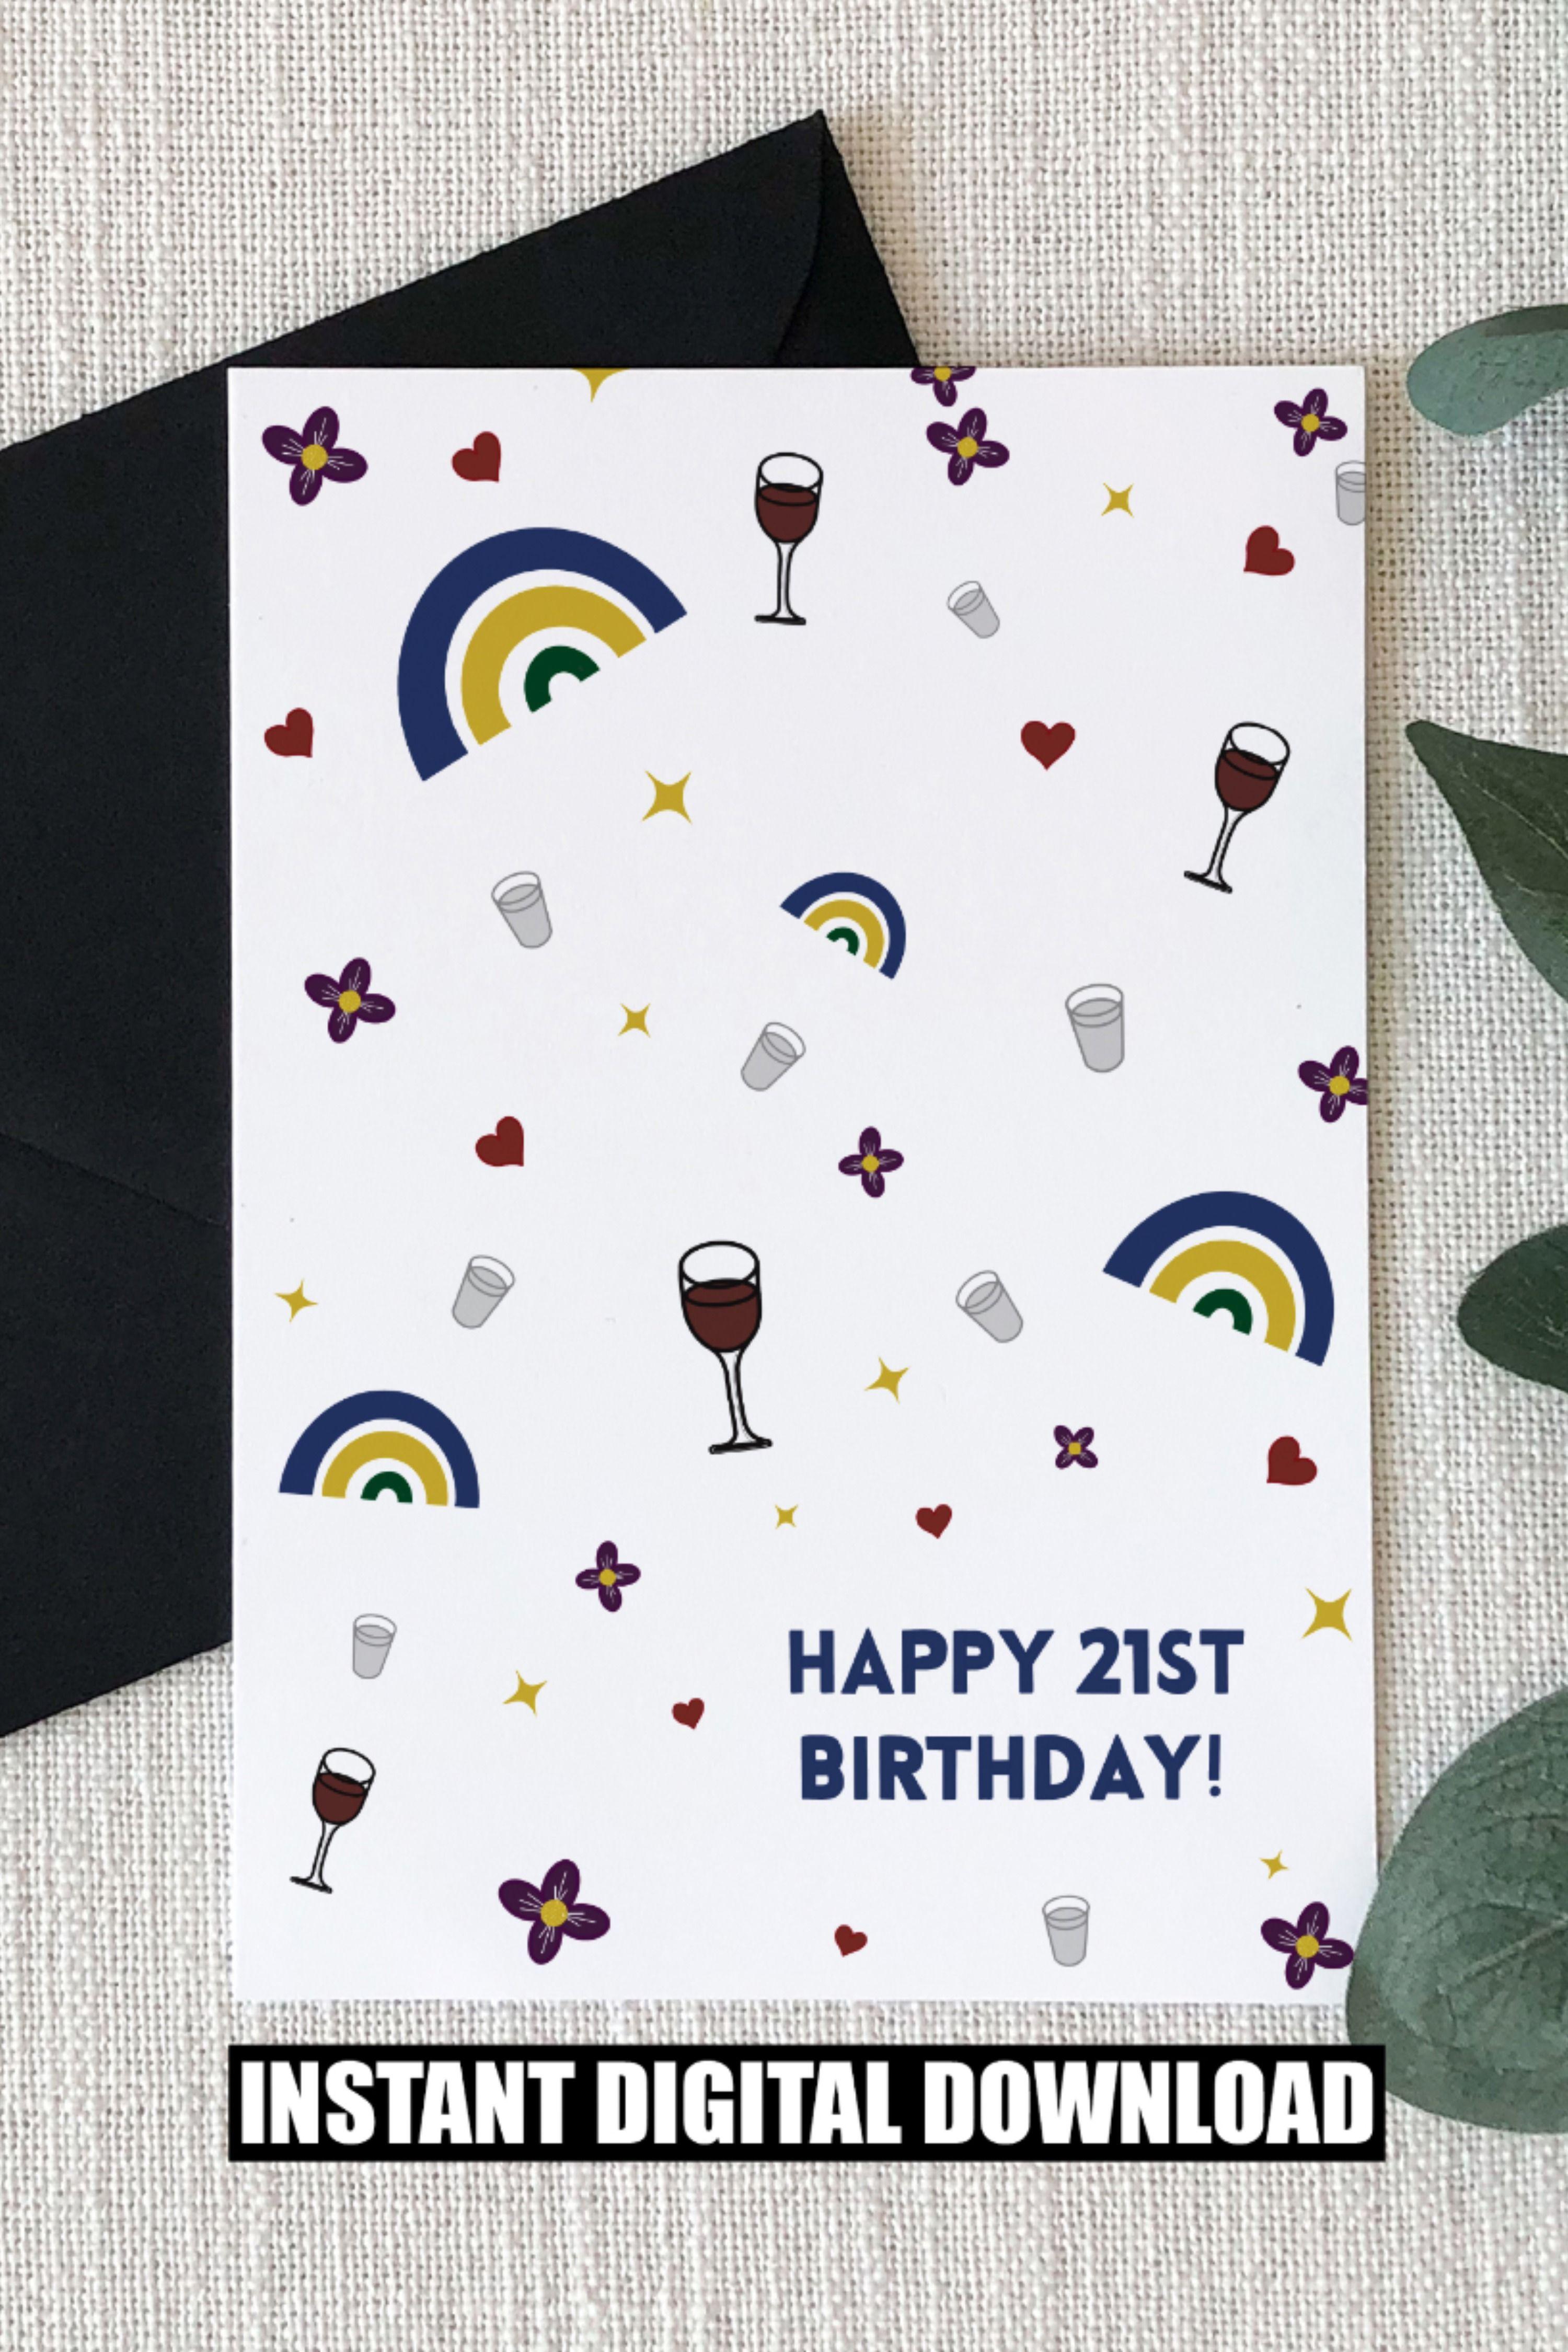 Happy 21st Birthday Shot Glass Wine Glass Printable Etsy Happy 21st Birthday Cards 21st Birthday Cards Birthday Cards